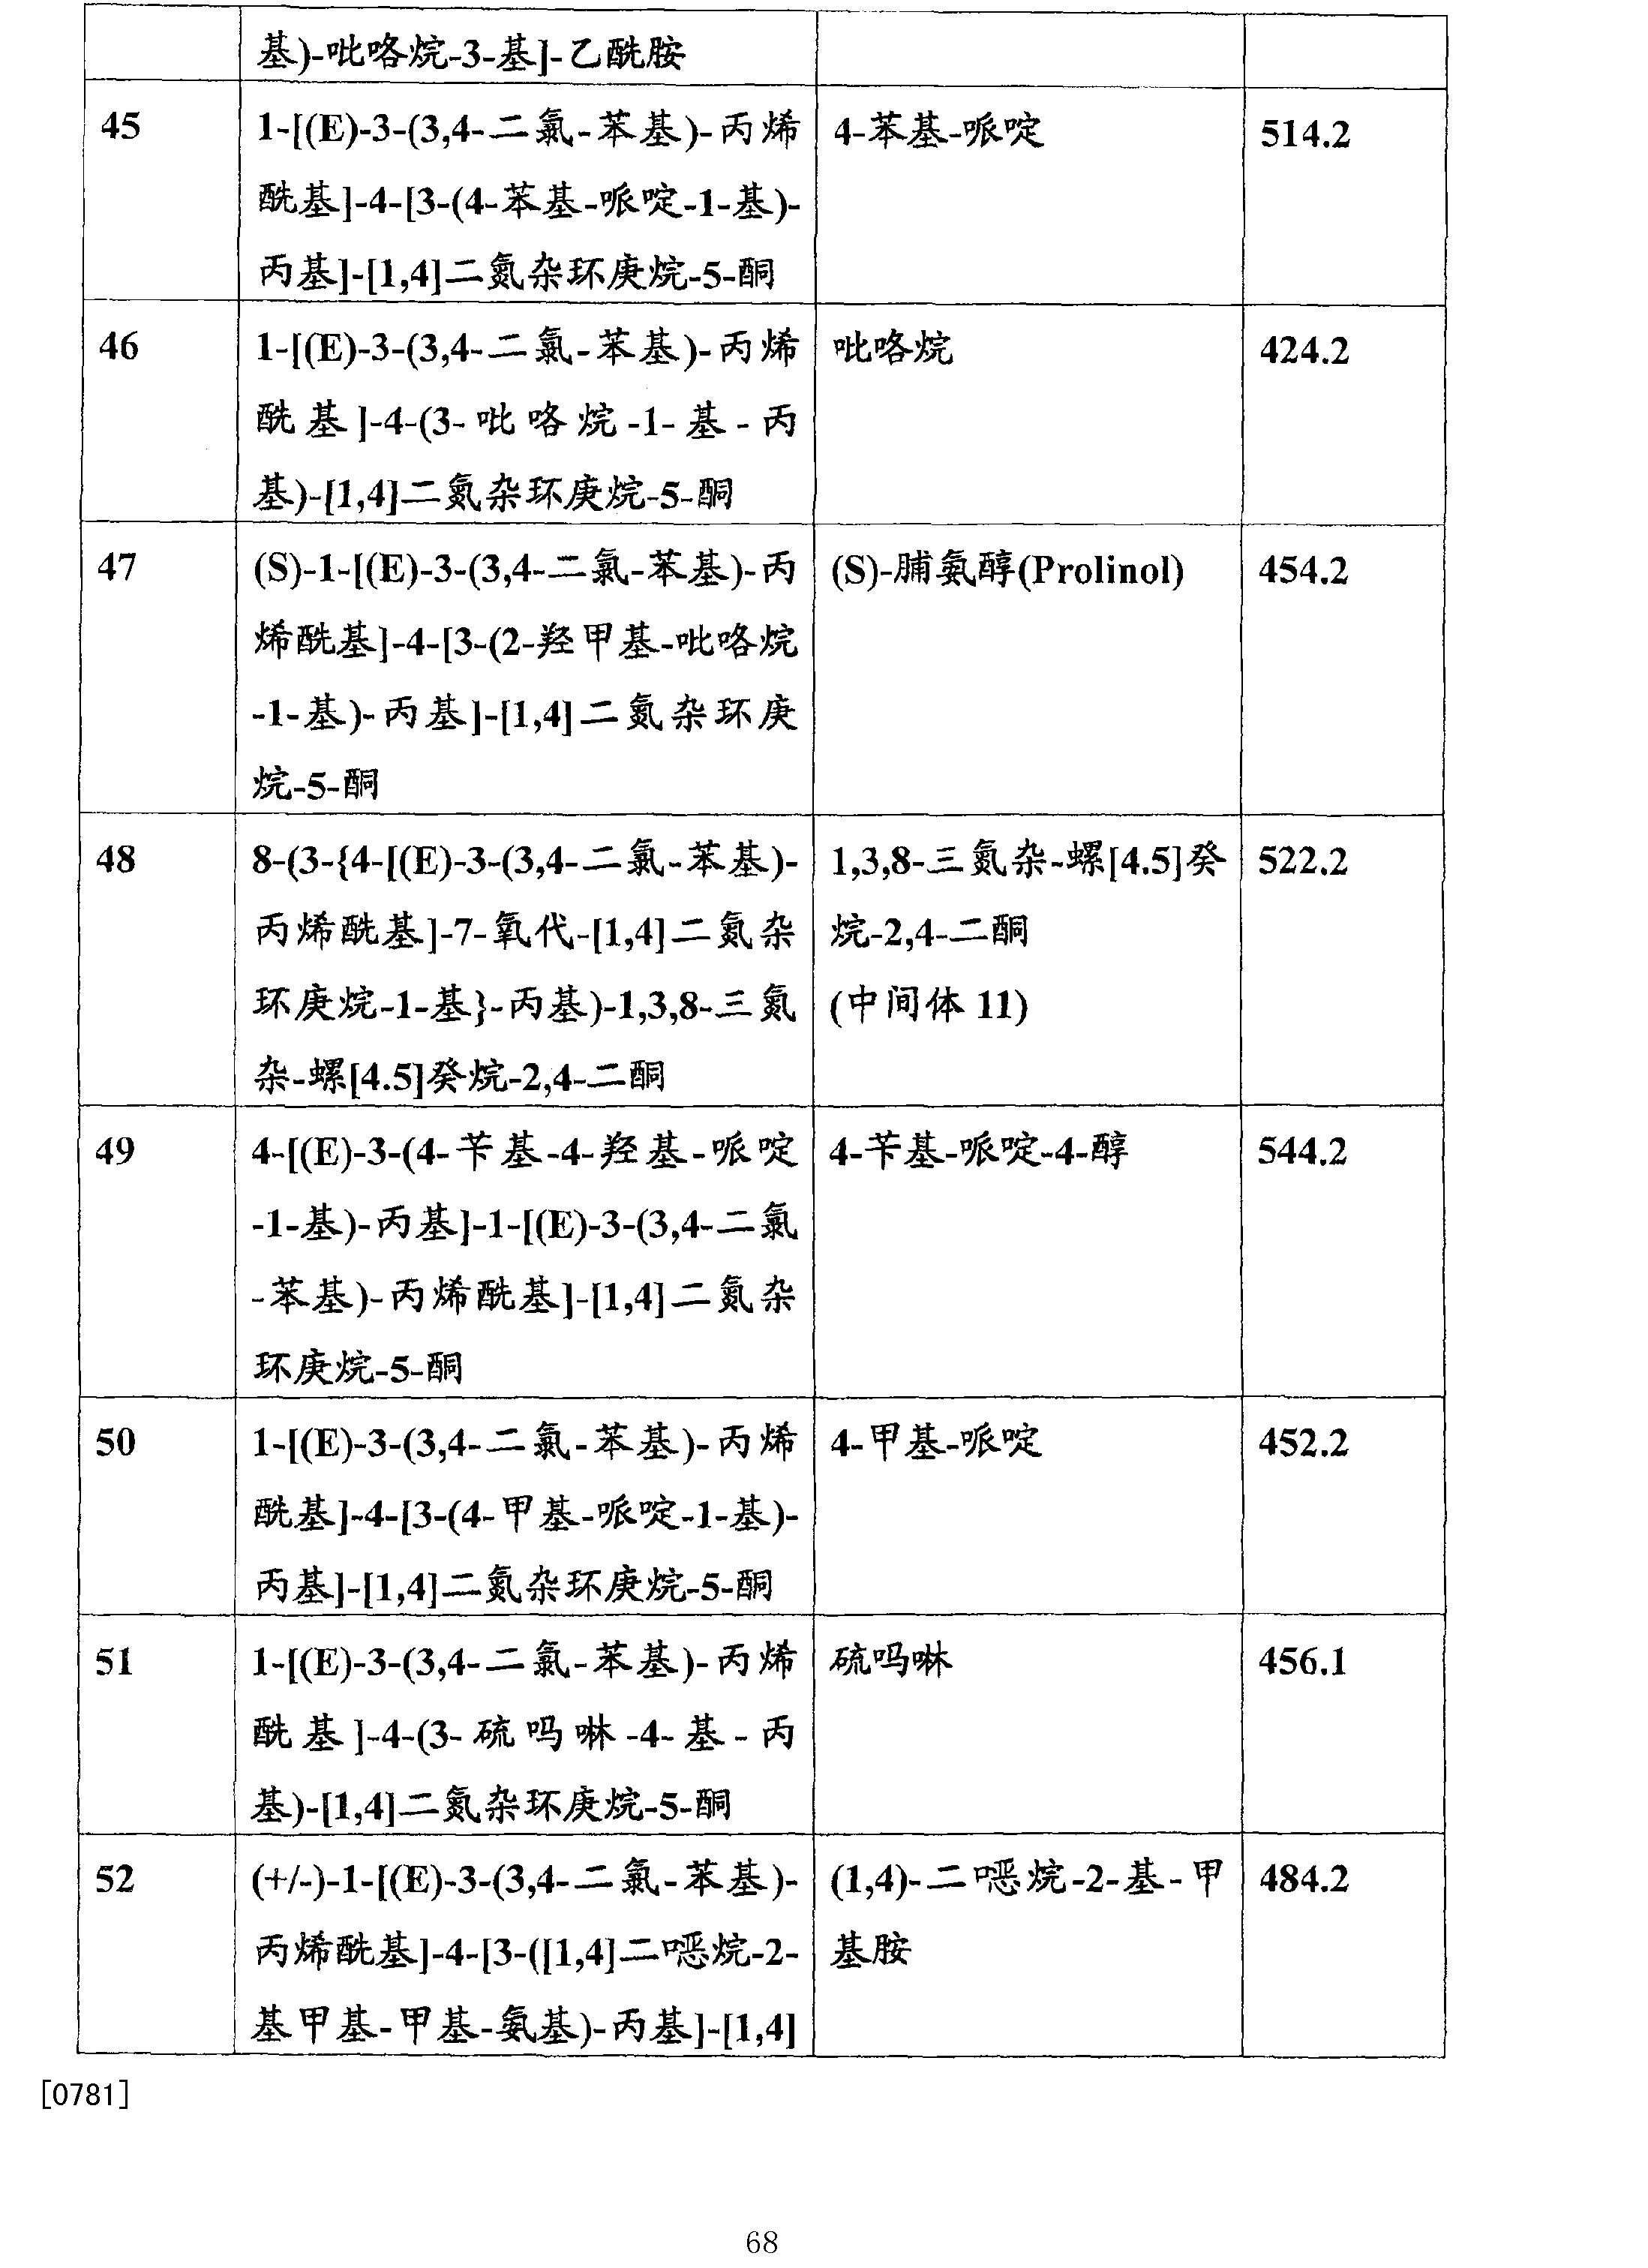 CN101472904B - Diazepan derivatives modulators of chemokine ... 04ad23f46b16